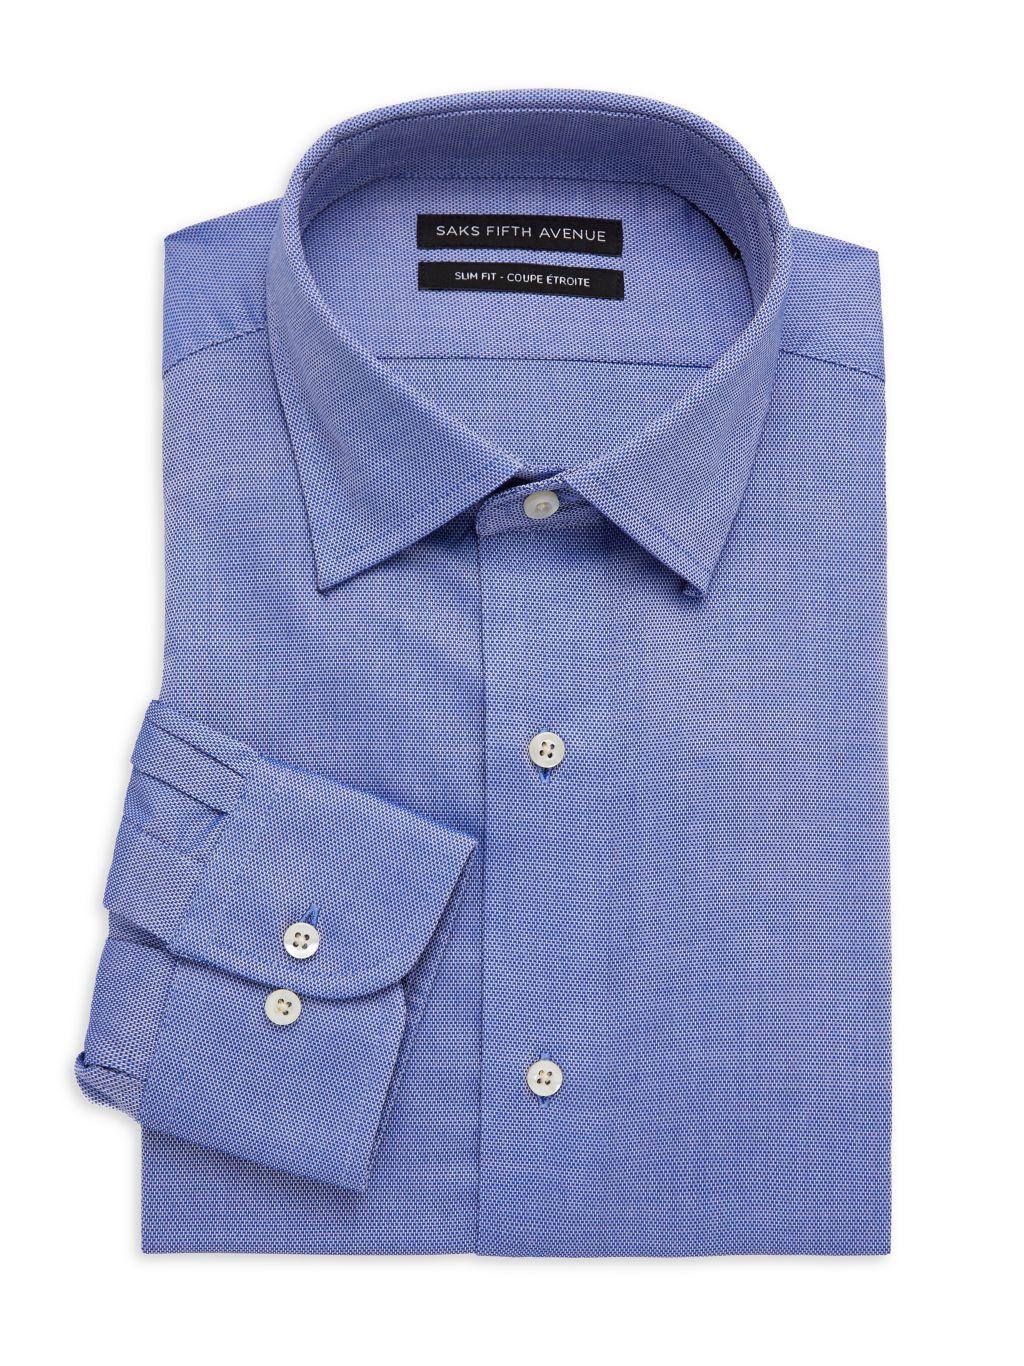 Saks Fifth Avenue Slim-Fit Patterned Dress Shirt